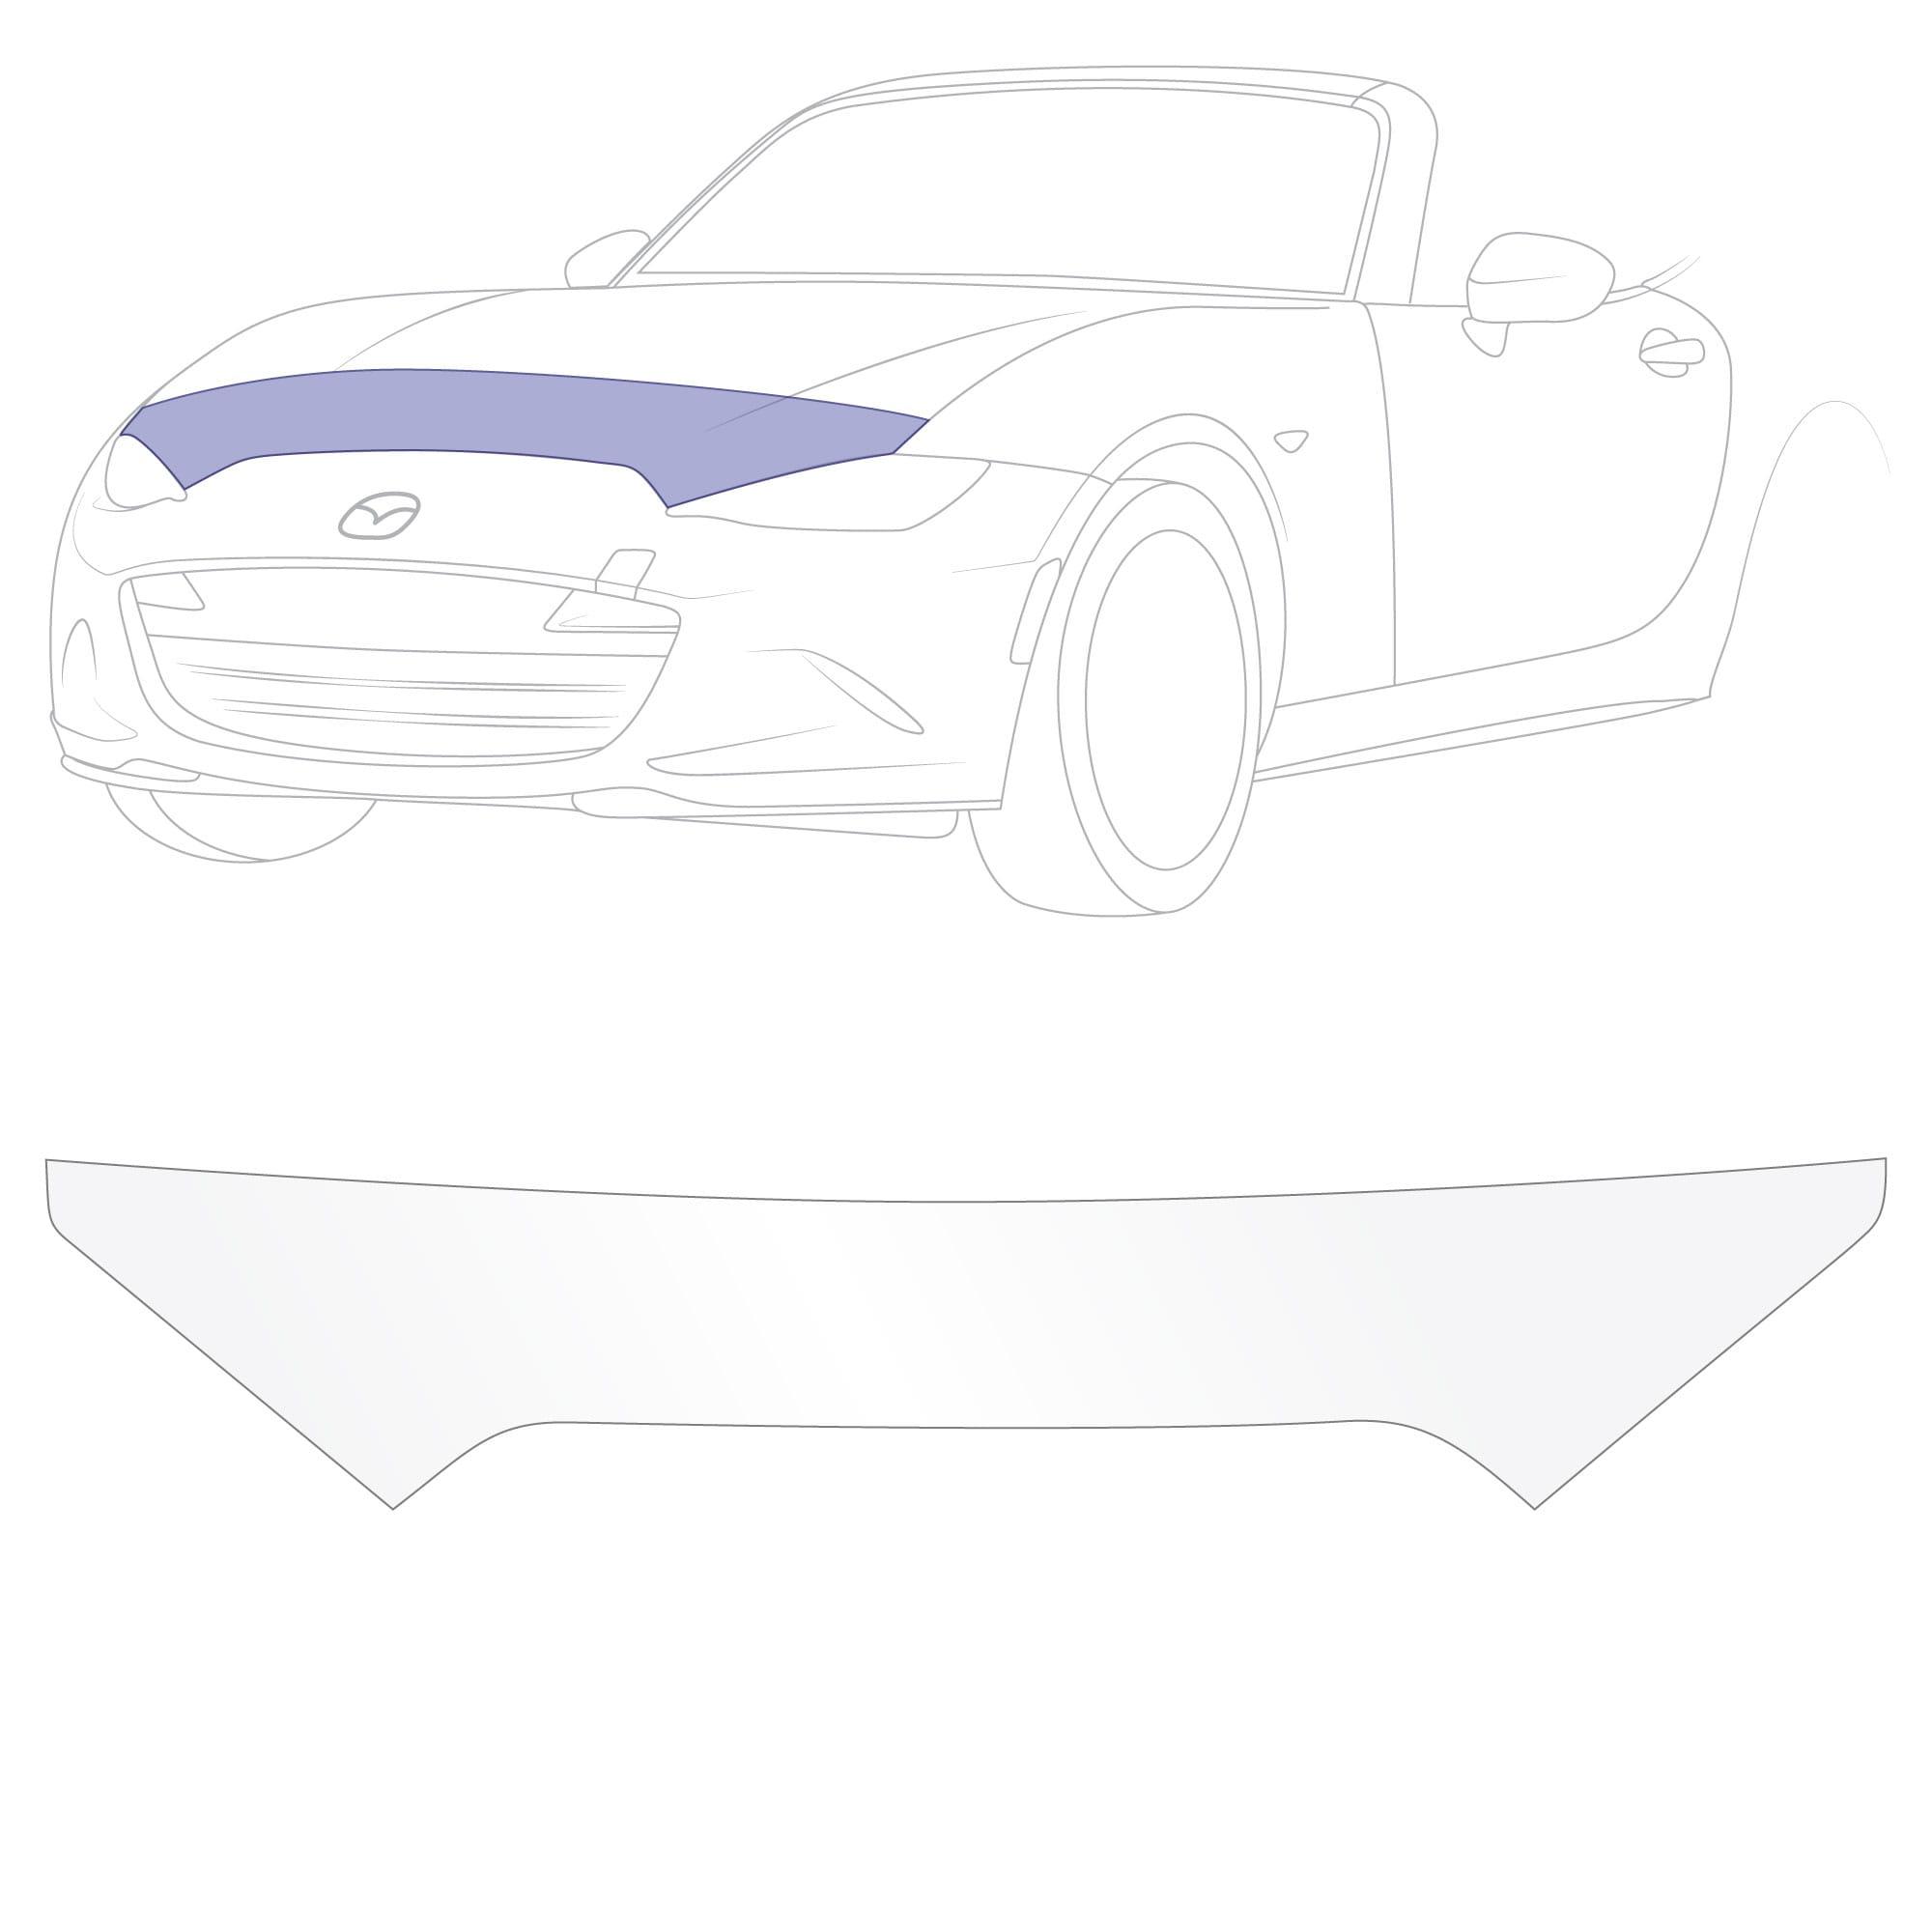 Mishimoto Windshield Washer Reservoir Tank For 2016 Mazda MX5 Miata